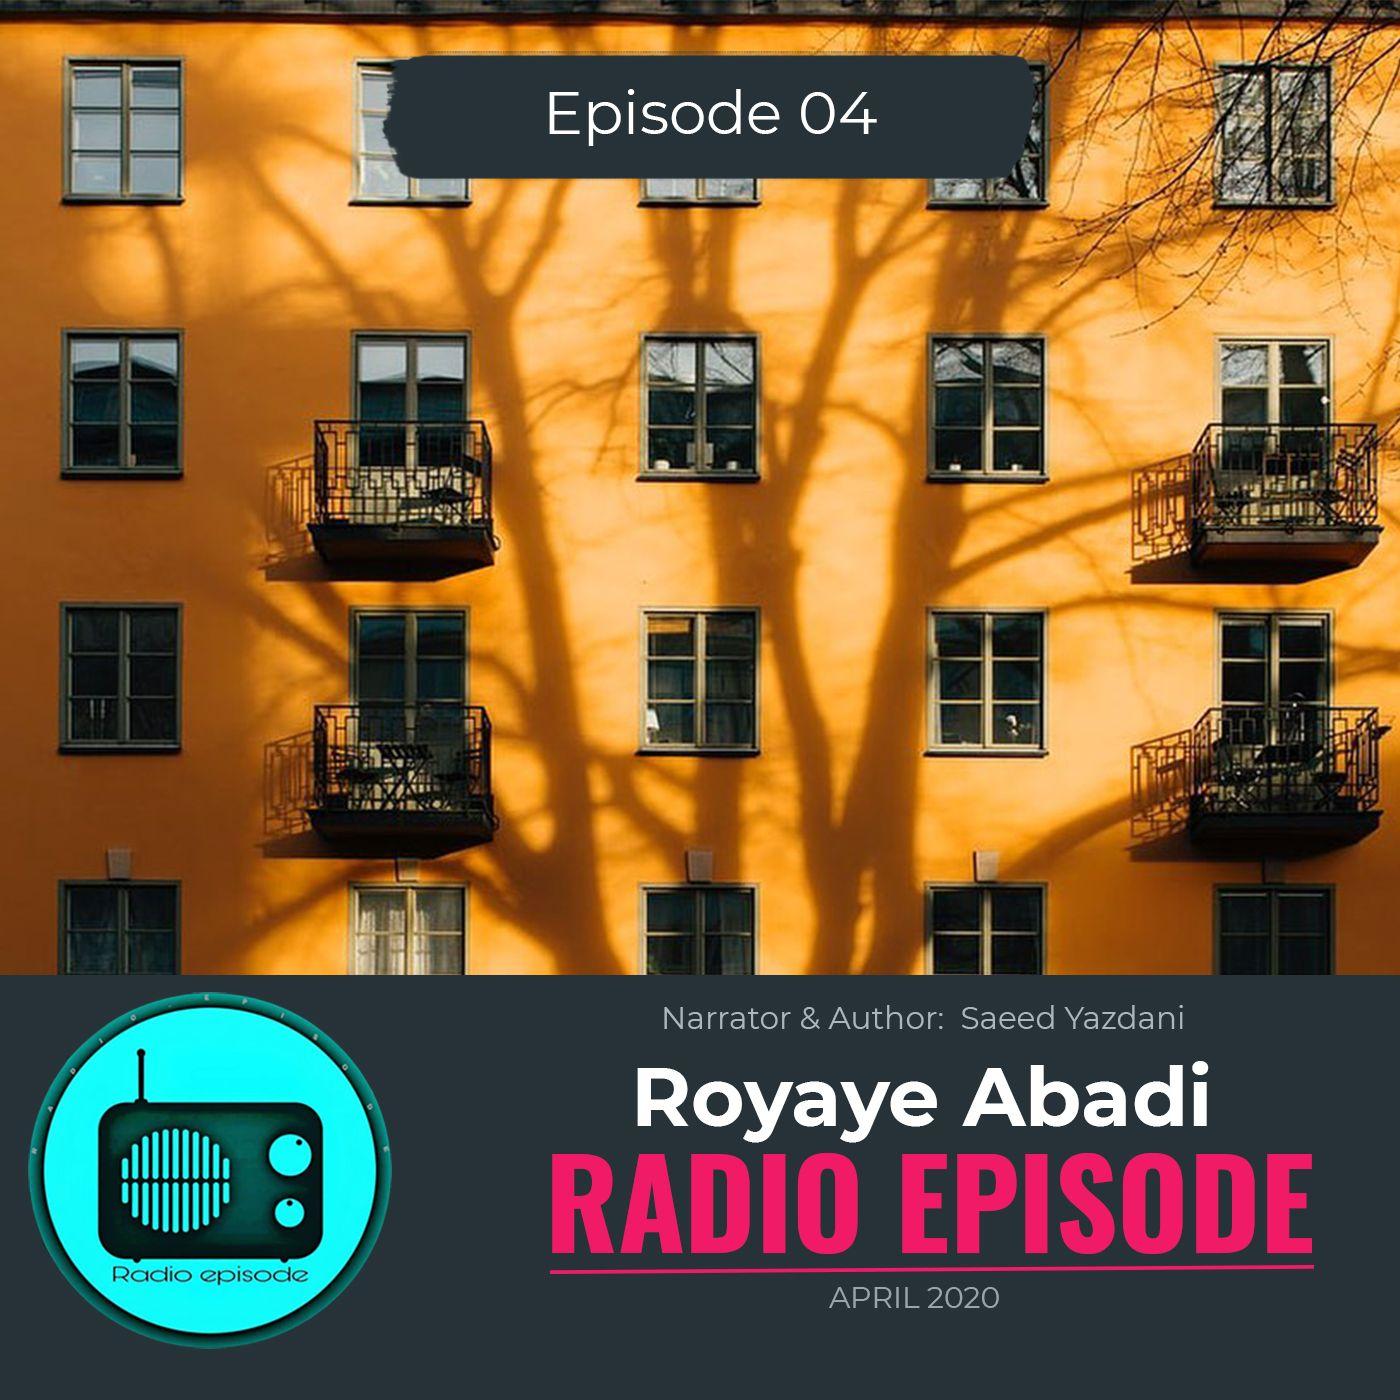 6c8cb3 episode 04 5 رادیو اپیزود